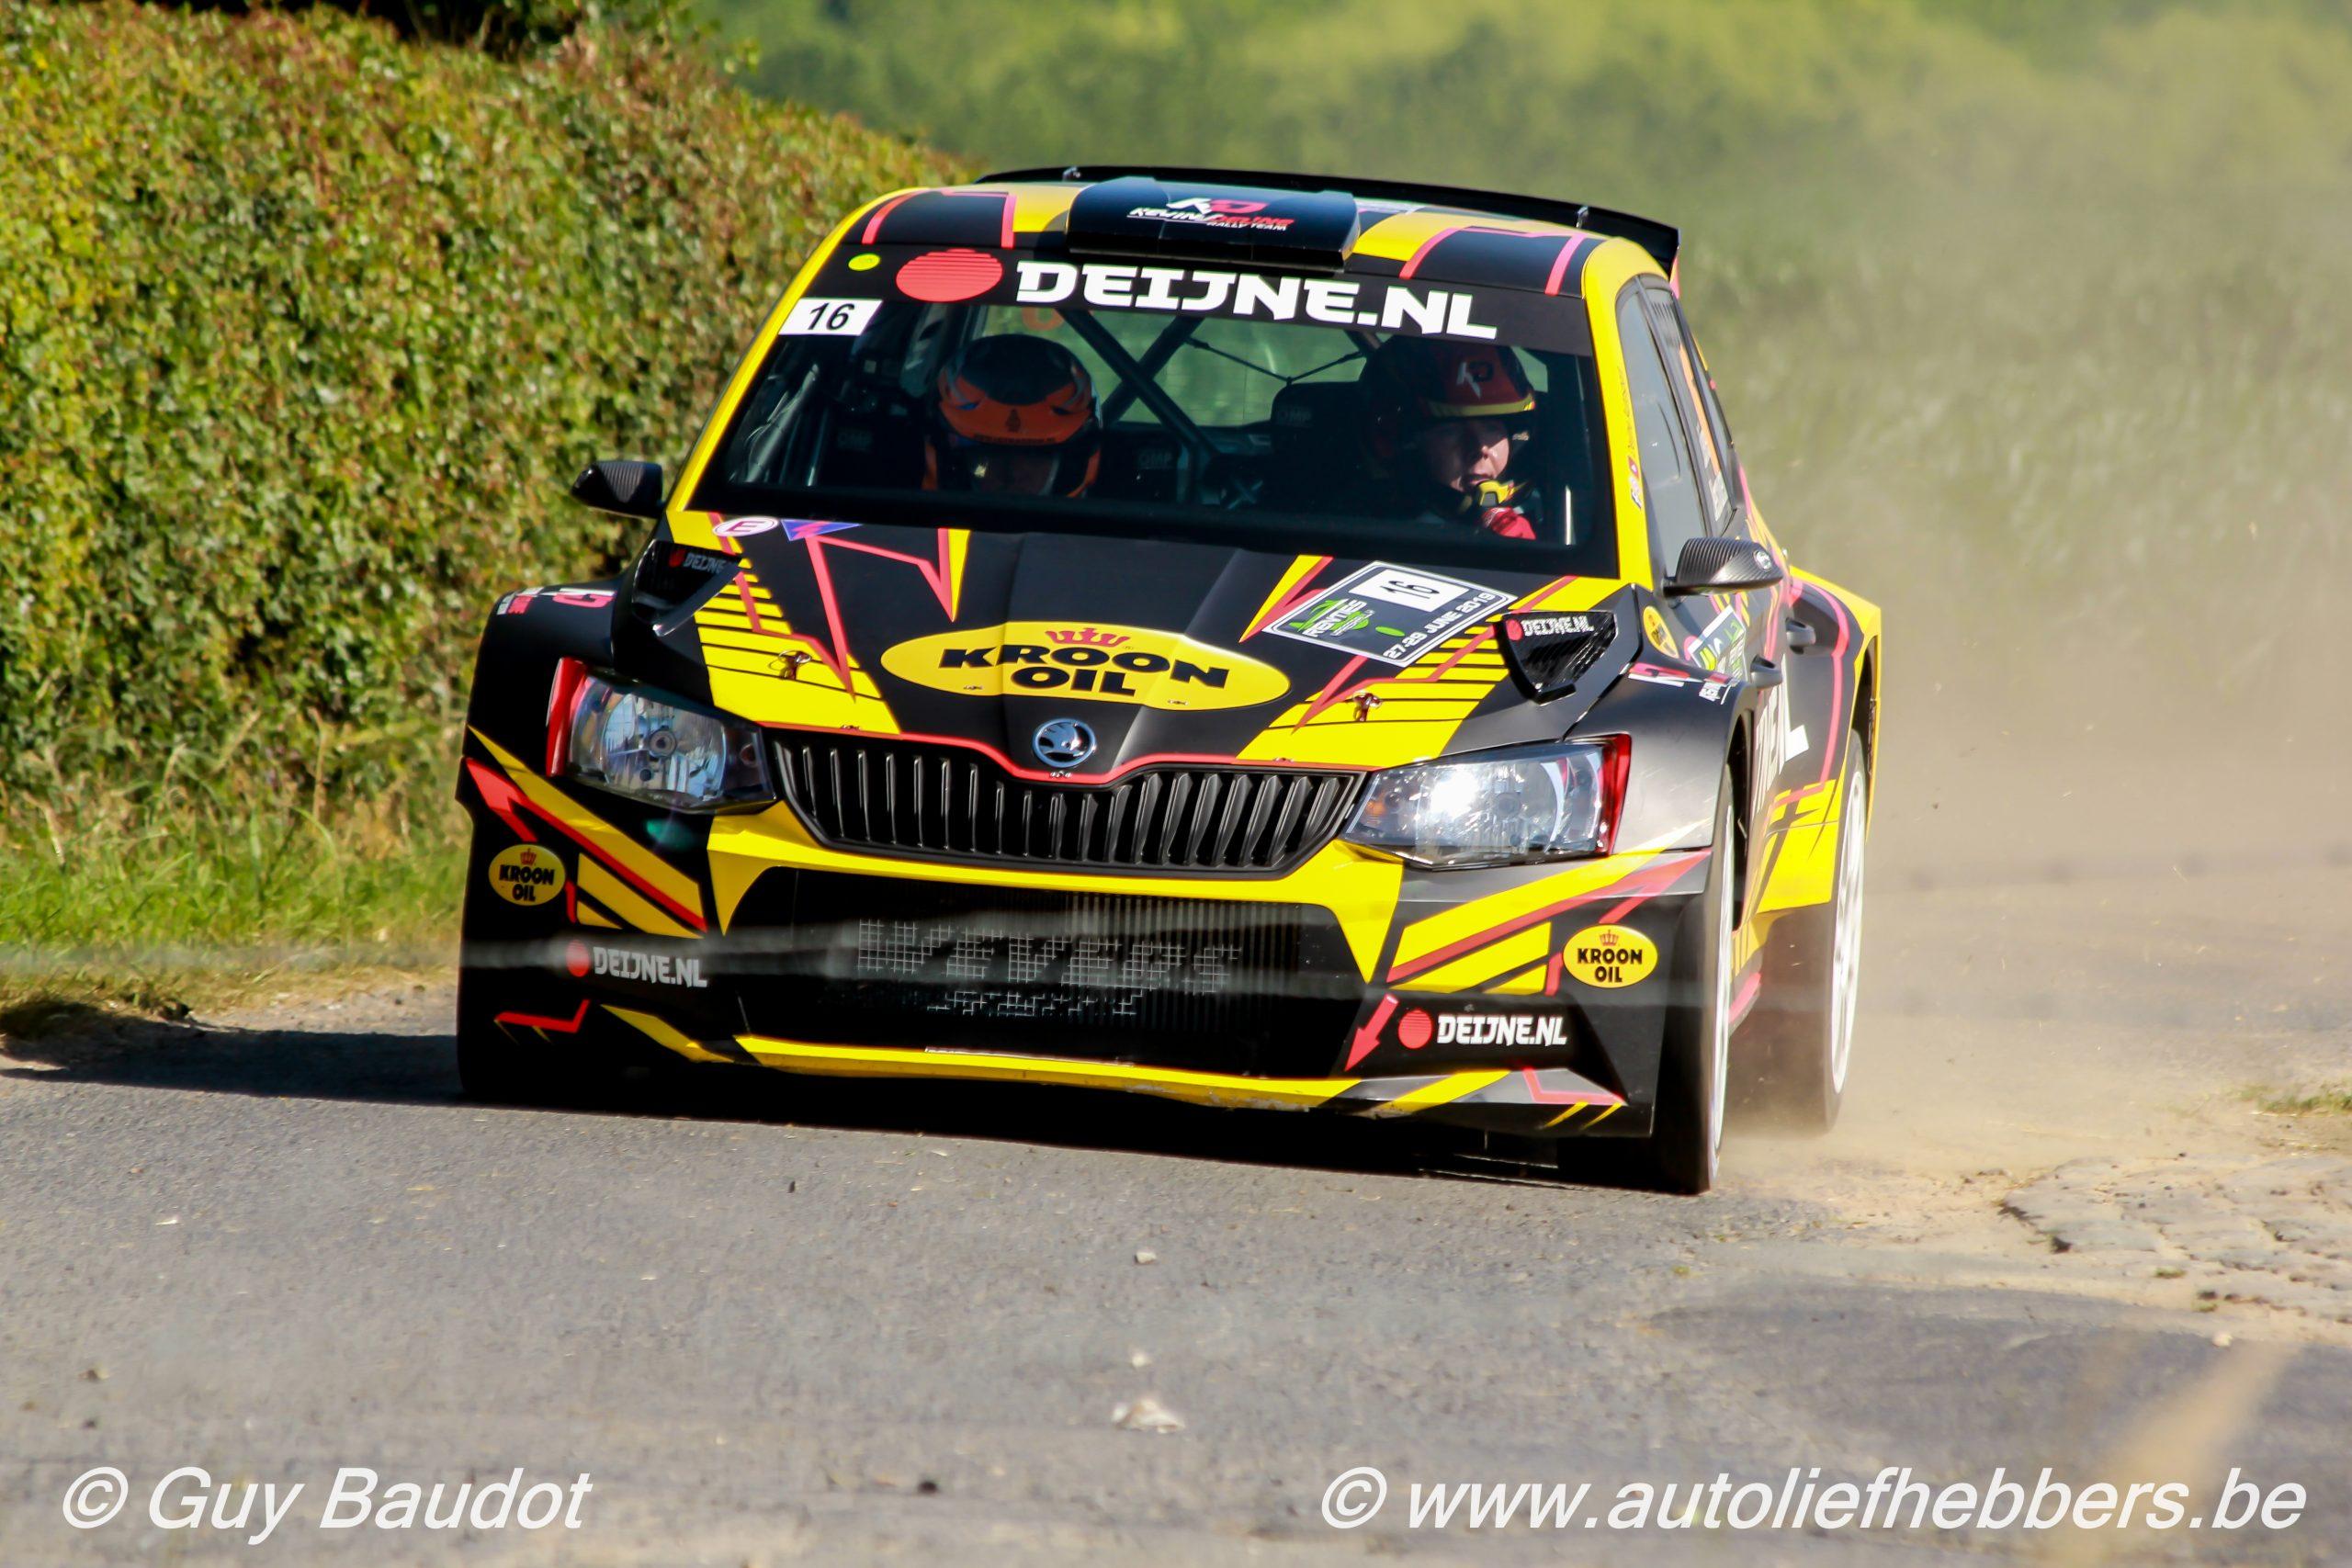 Powerstage in tweedaagse rally's van het Kroon-Oil Belgian Rally Championship